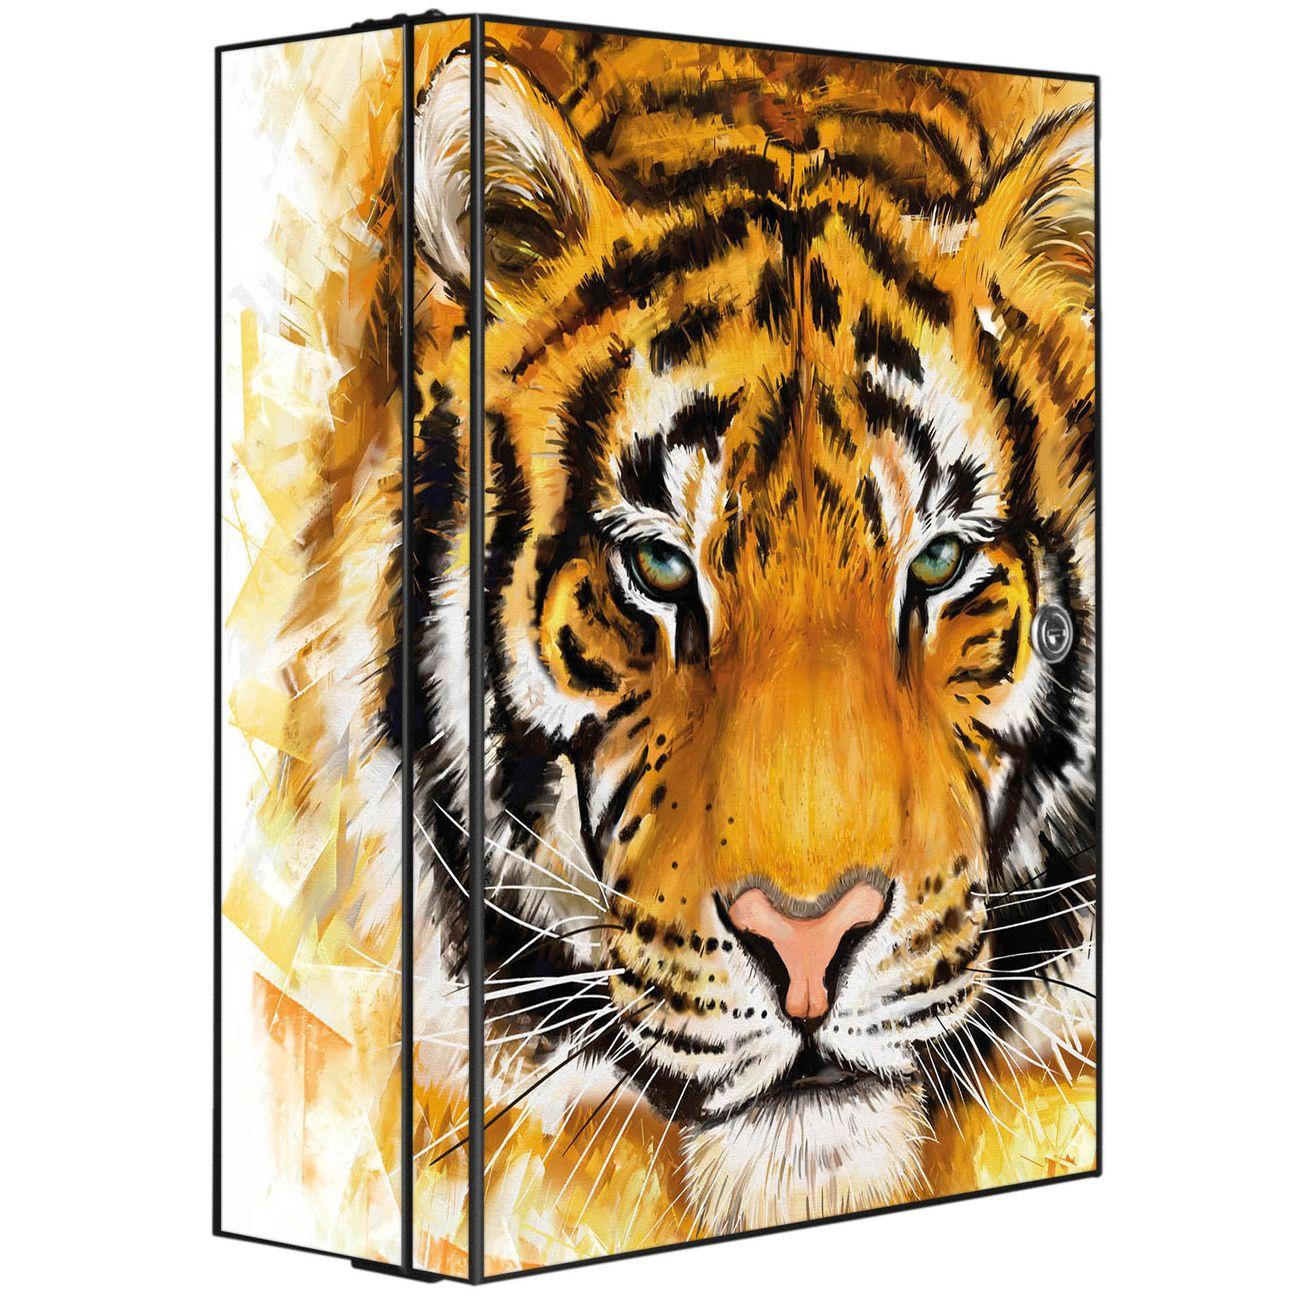 Medizinschrank Stahl Motiv Tigerkopf